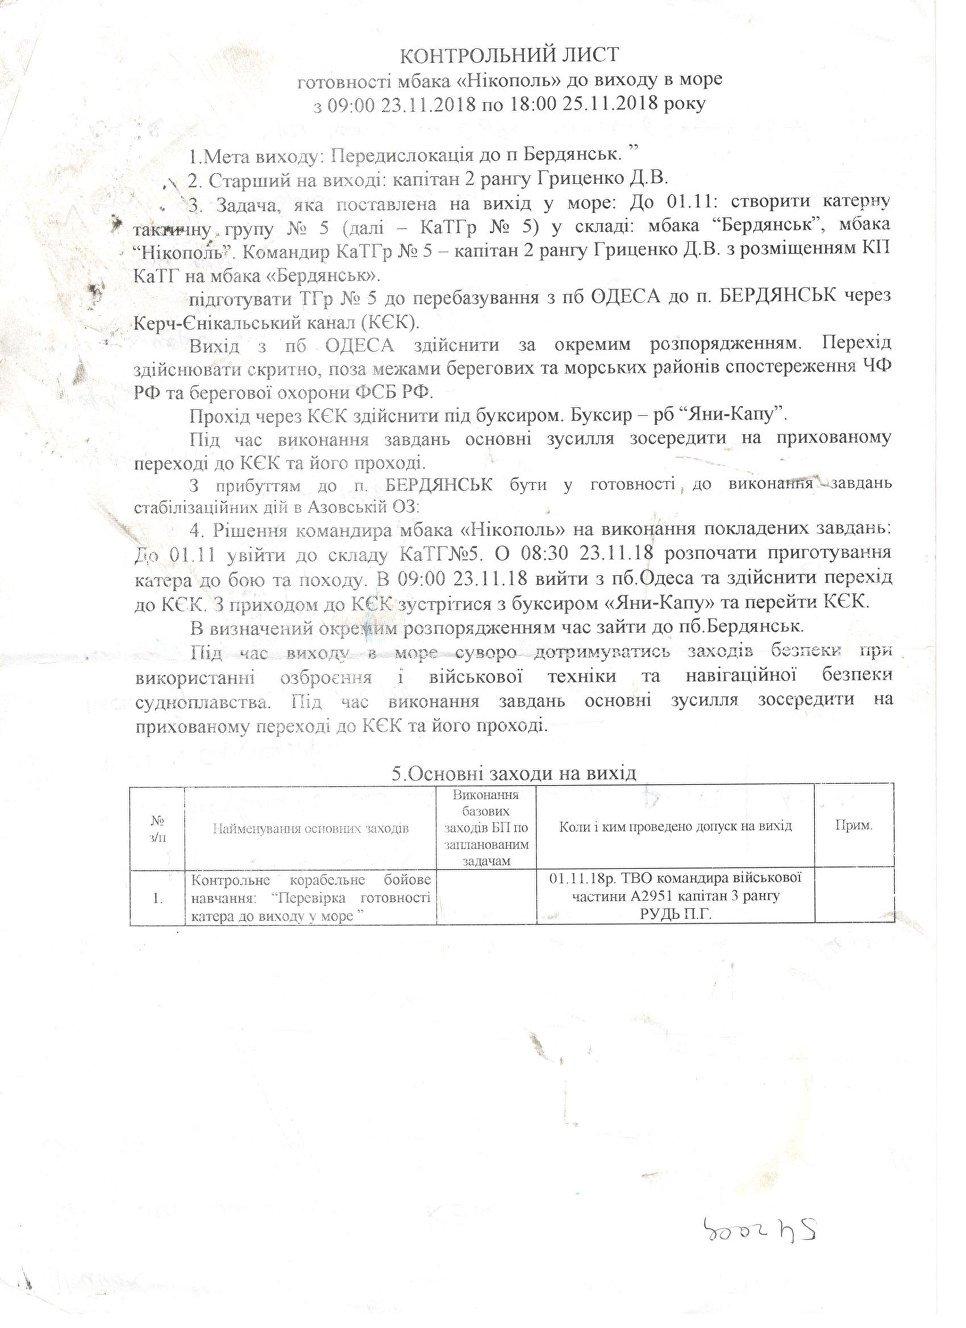 https://static.novayagazeta.ru/storage/content/pictures/22010/content_1533641015.jpg